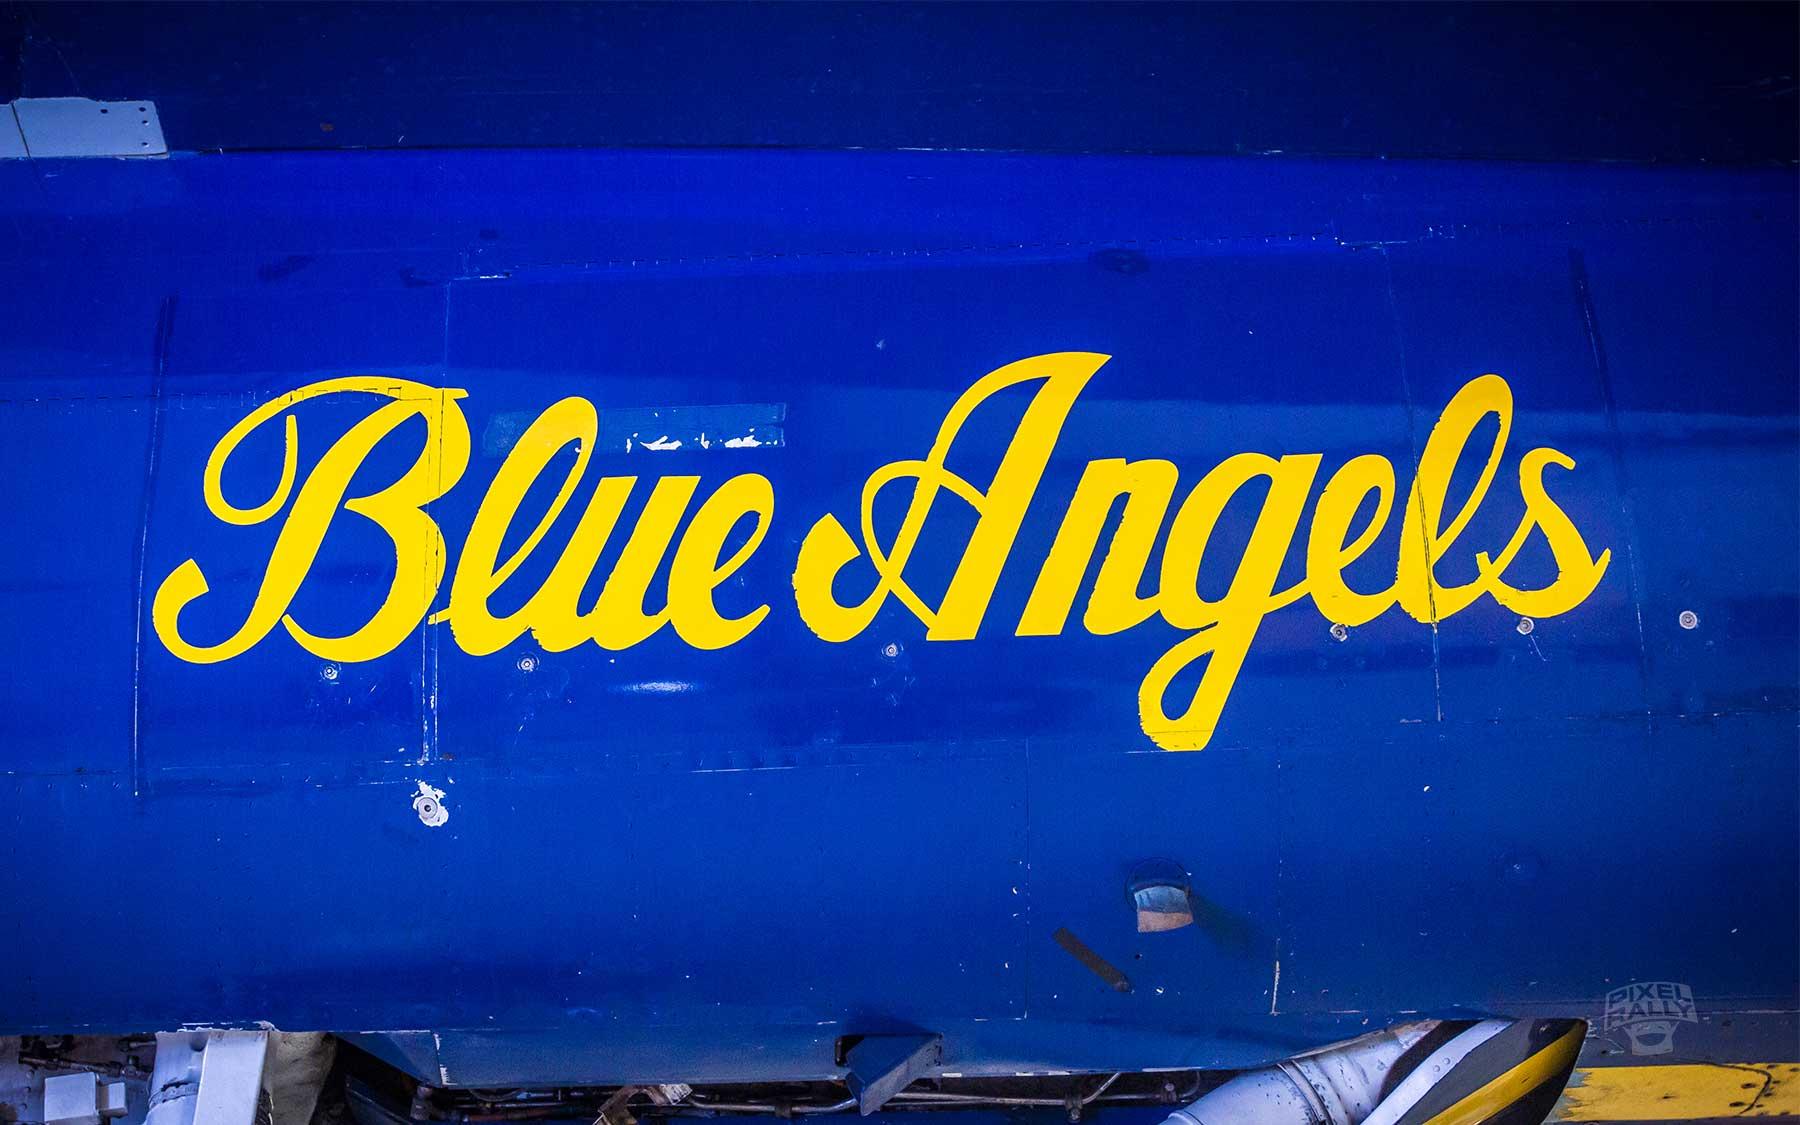 FL-WarbirdsMuseum-blue-angels-script